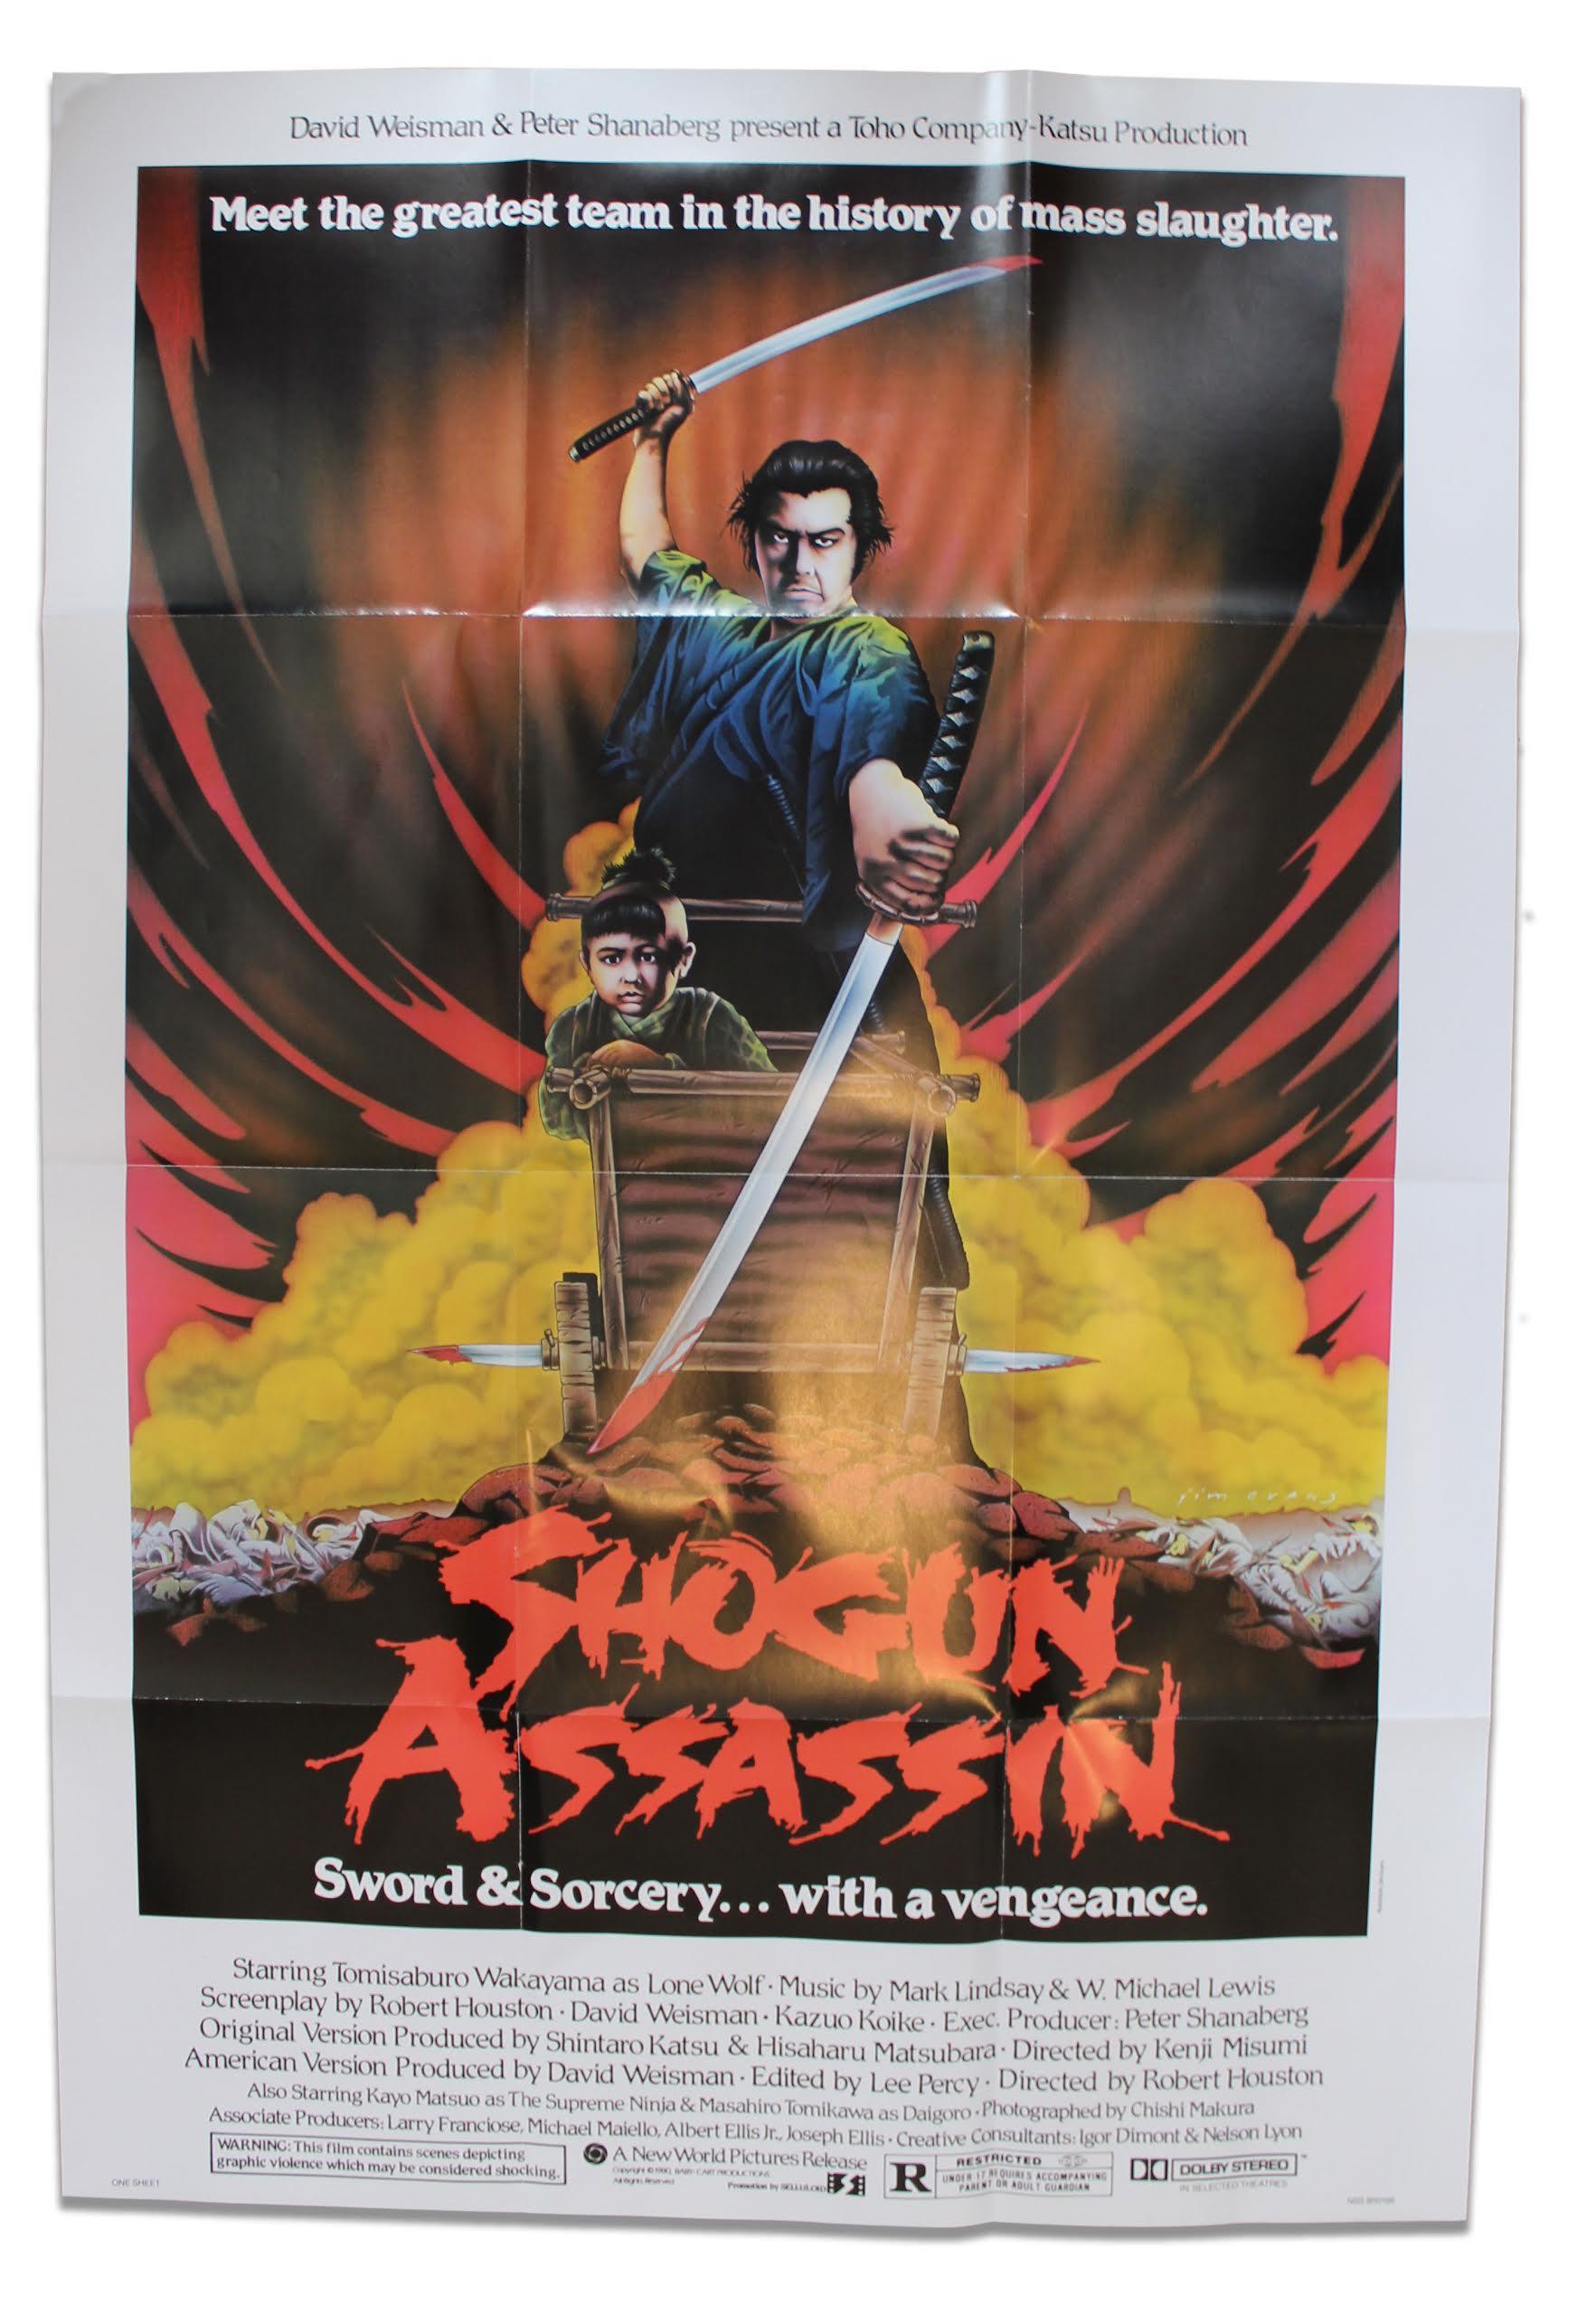 Shogun Assassin Original Motion Picture Soundtrack